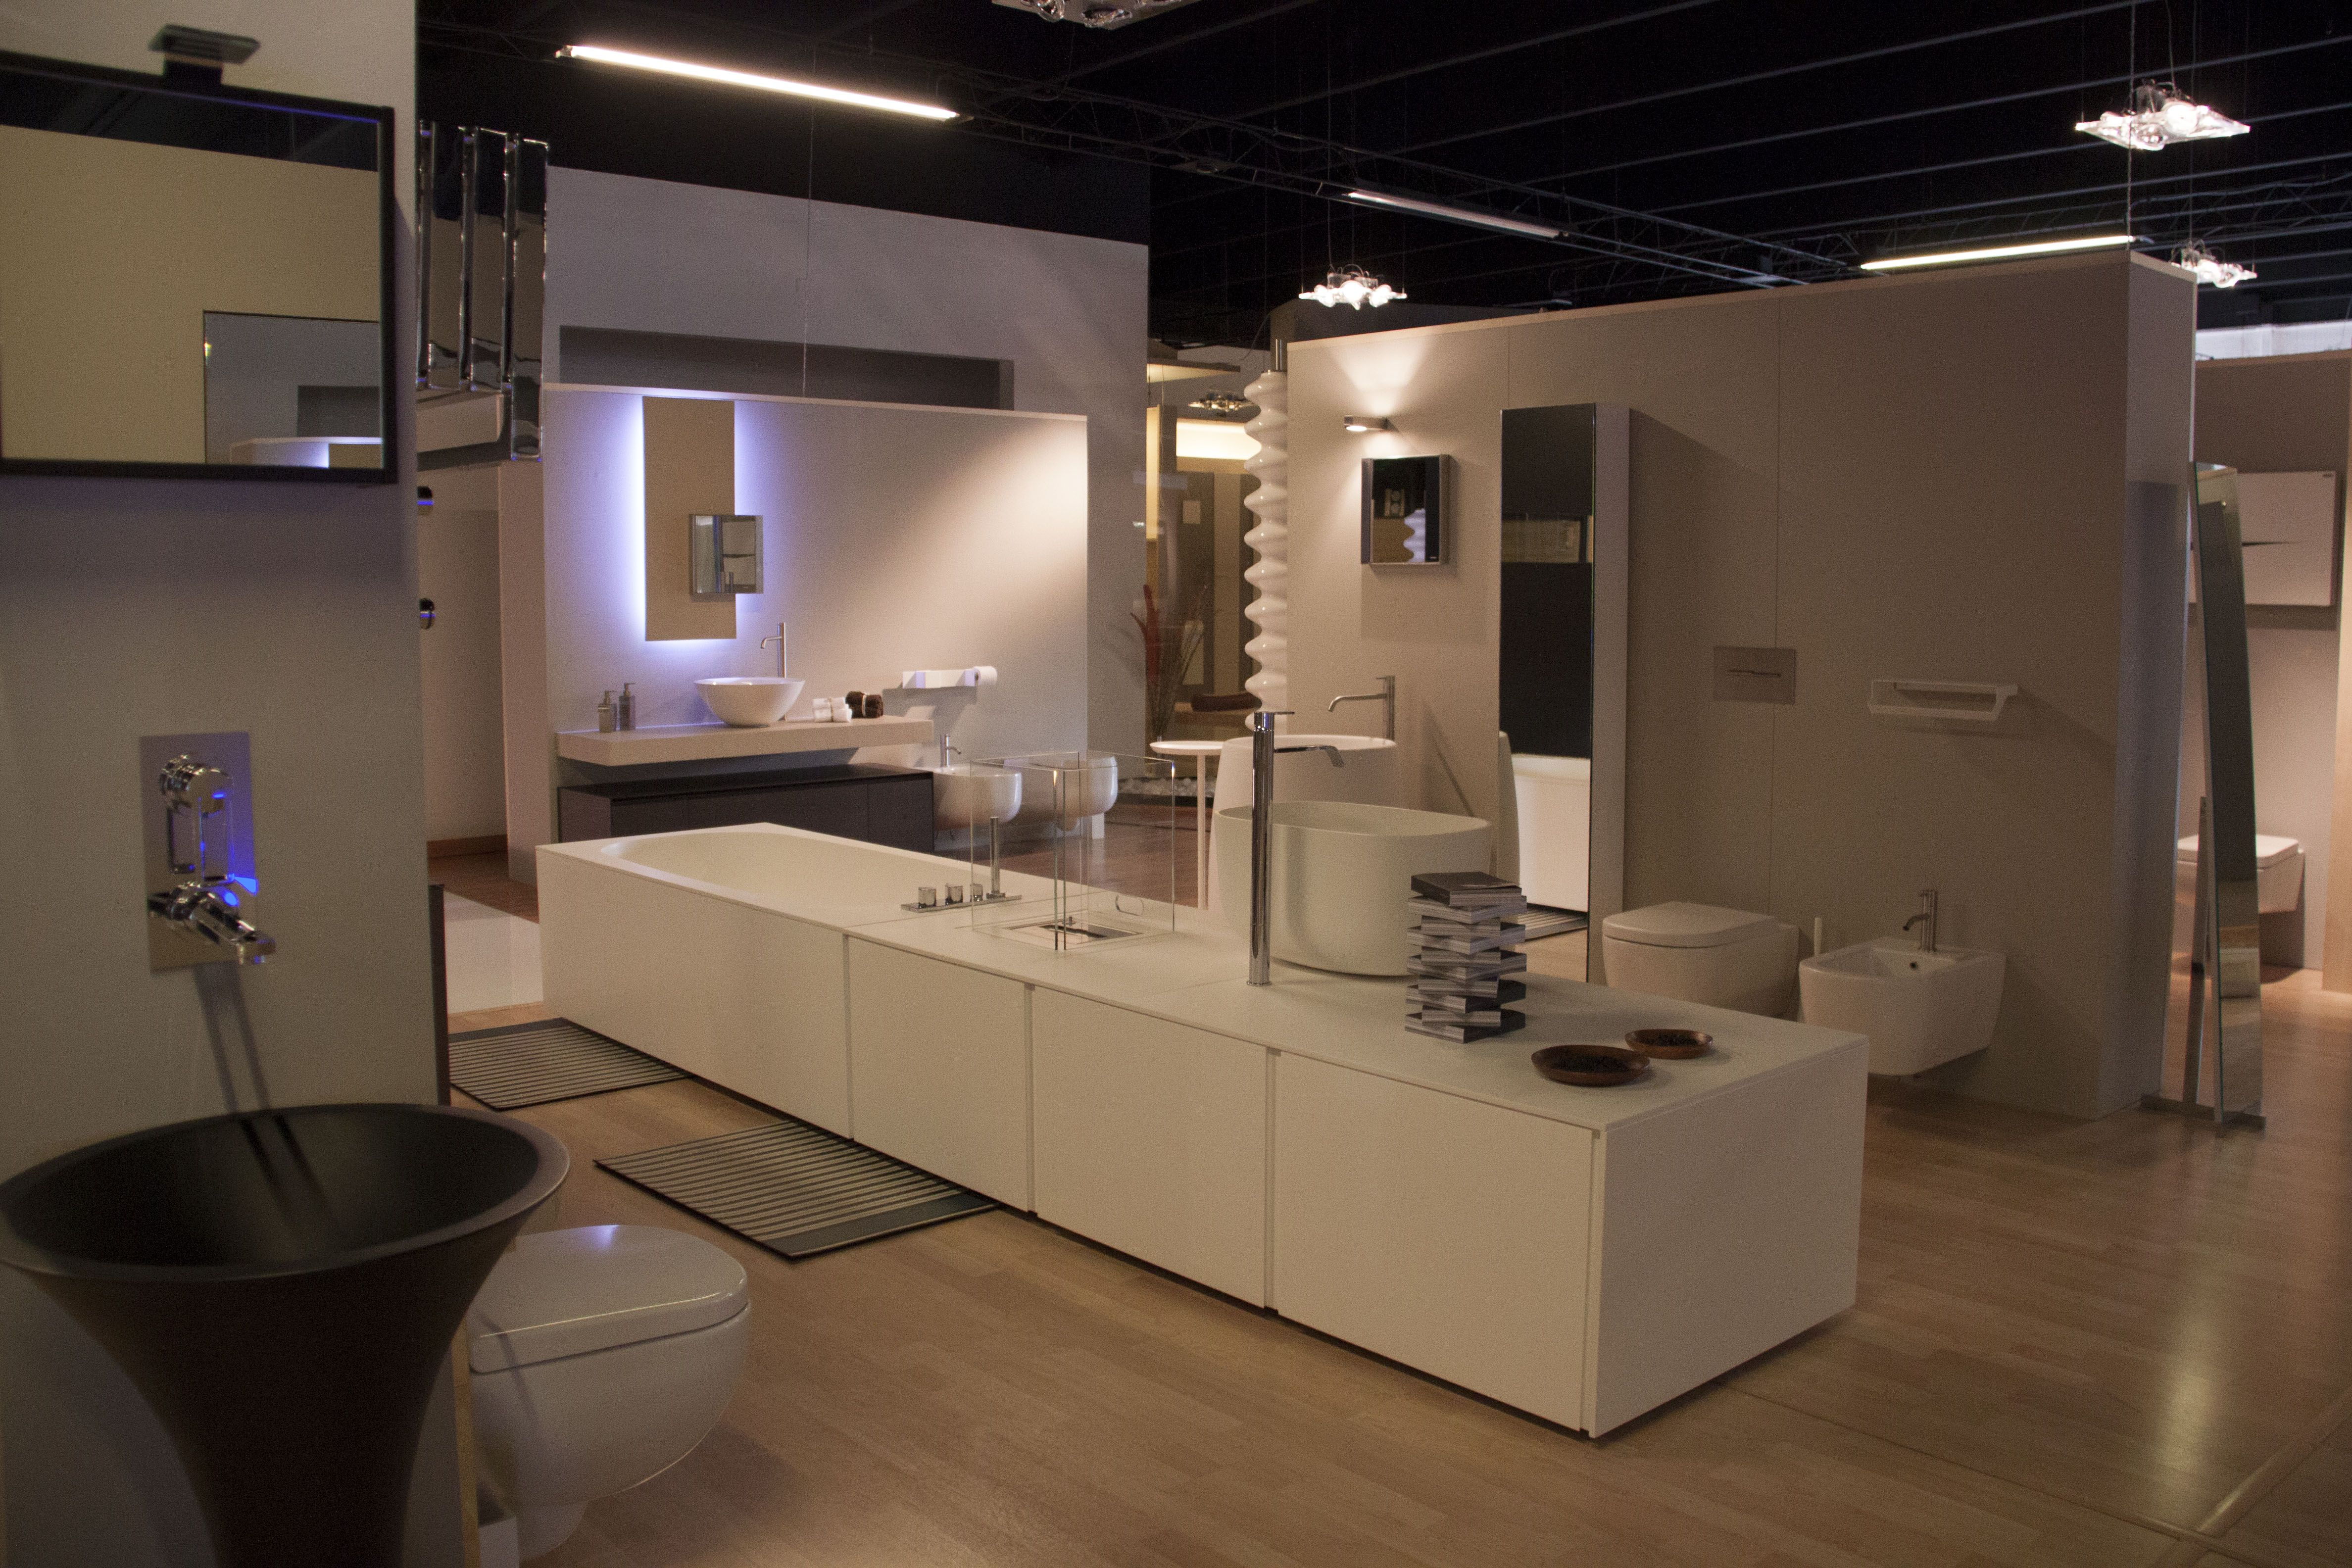 Bathroom Design Showroom showroom 2 #stipbagni #roevolciano #trento #salò #spa #wellness